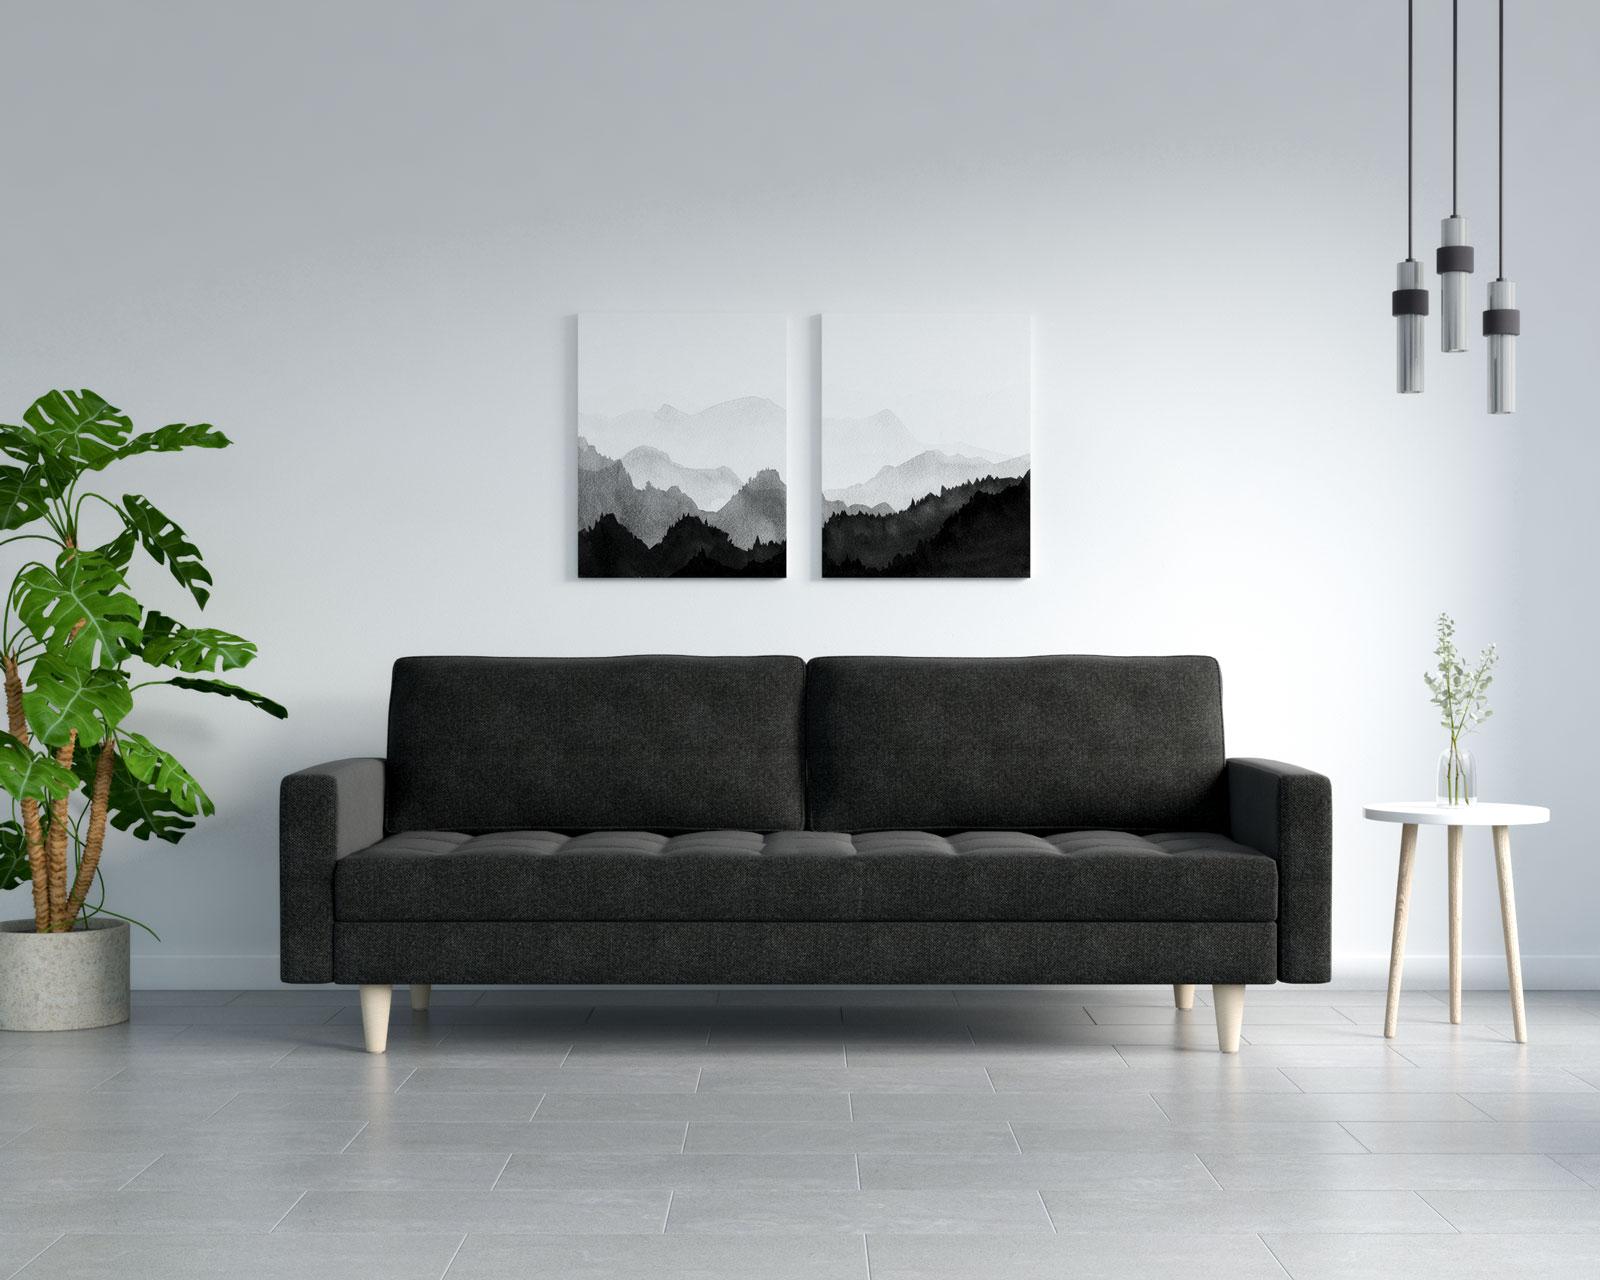 Black sofa with grey flooring